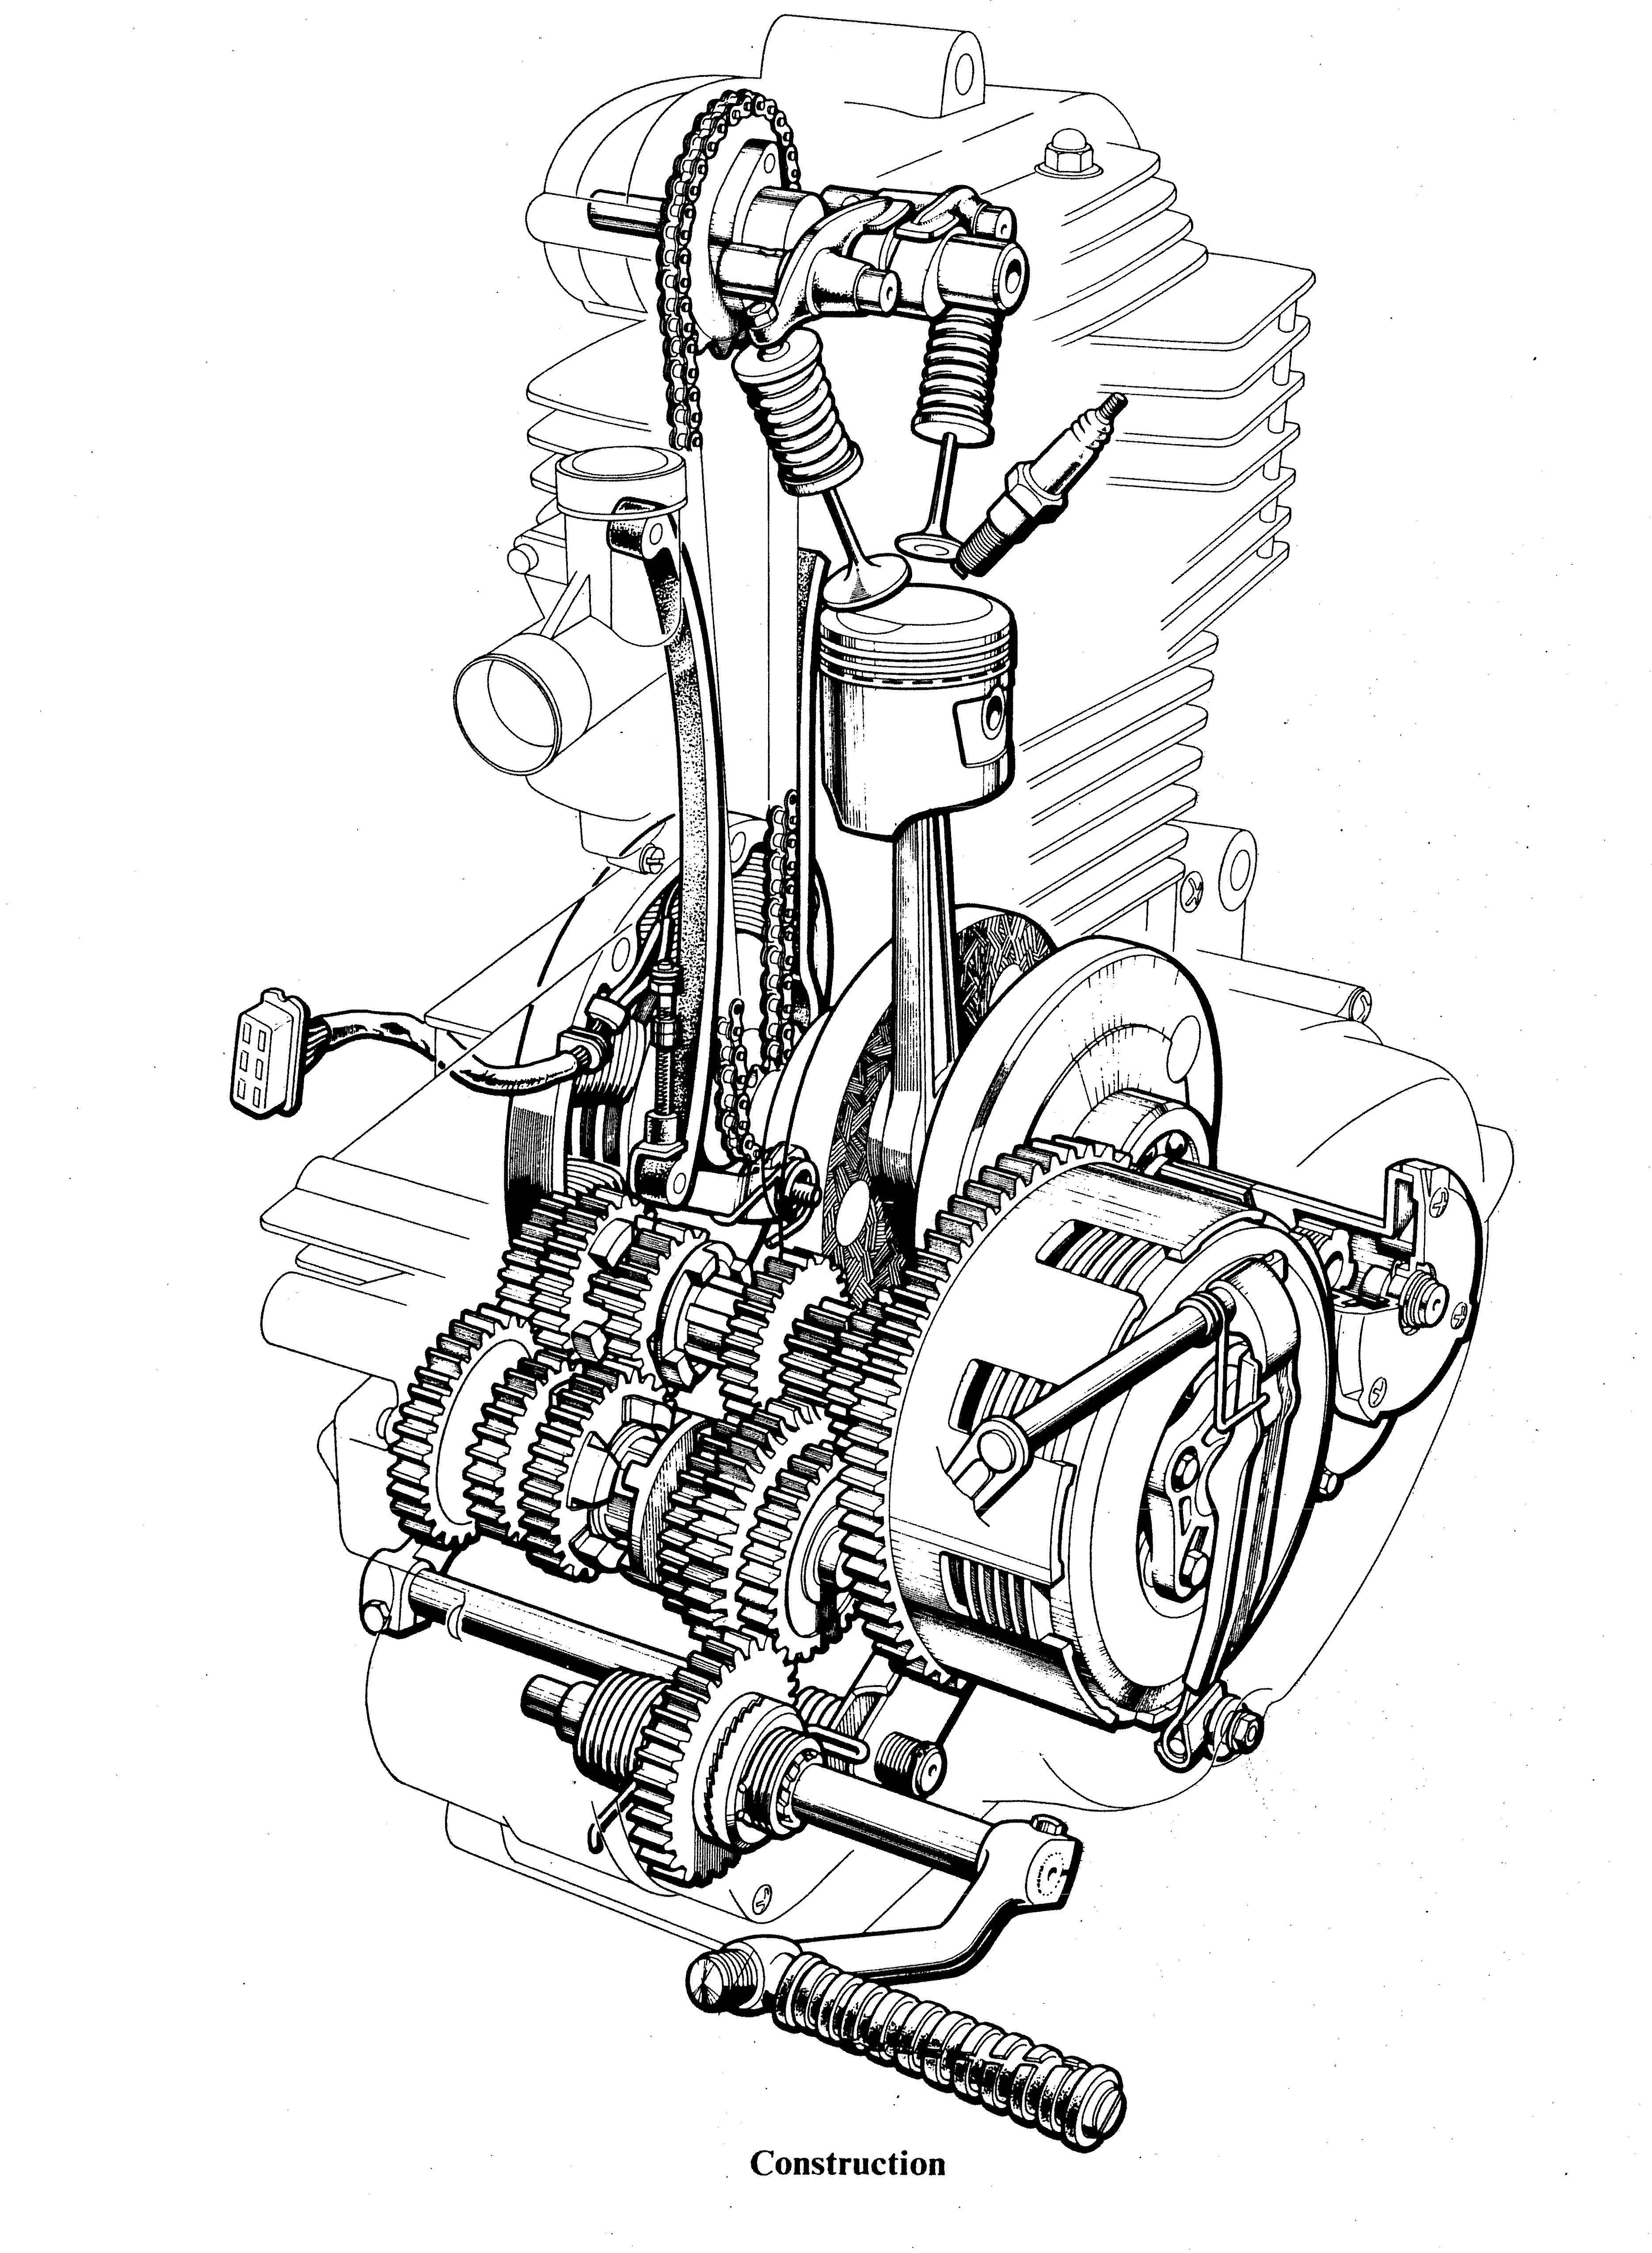 honda xrm 125 cdi wiring diagram husqvarna chainsaw fuel line cb engine diagram. honda. auto